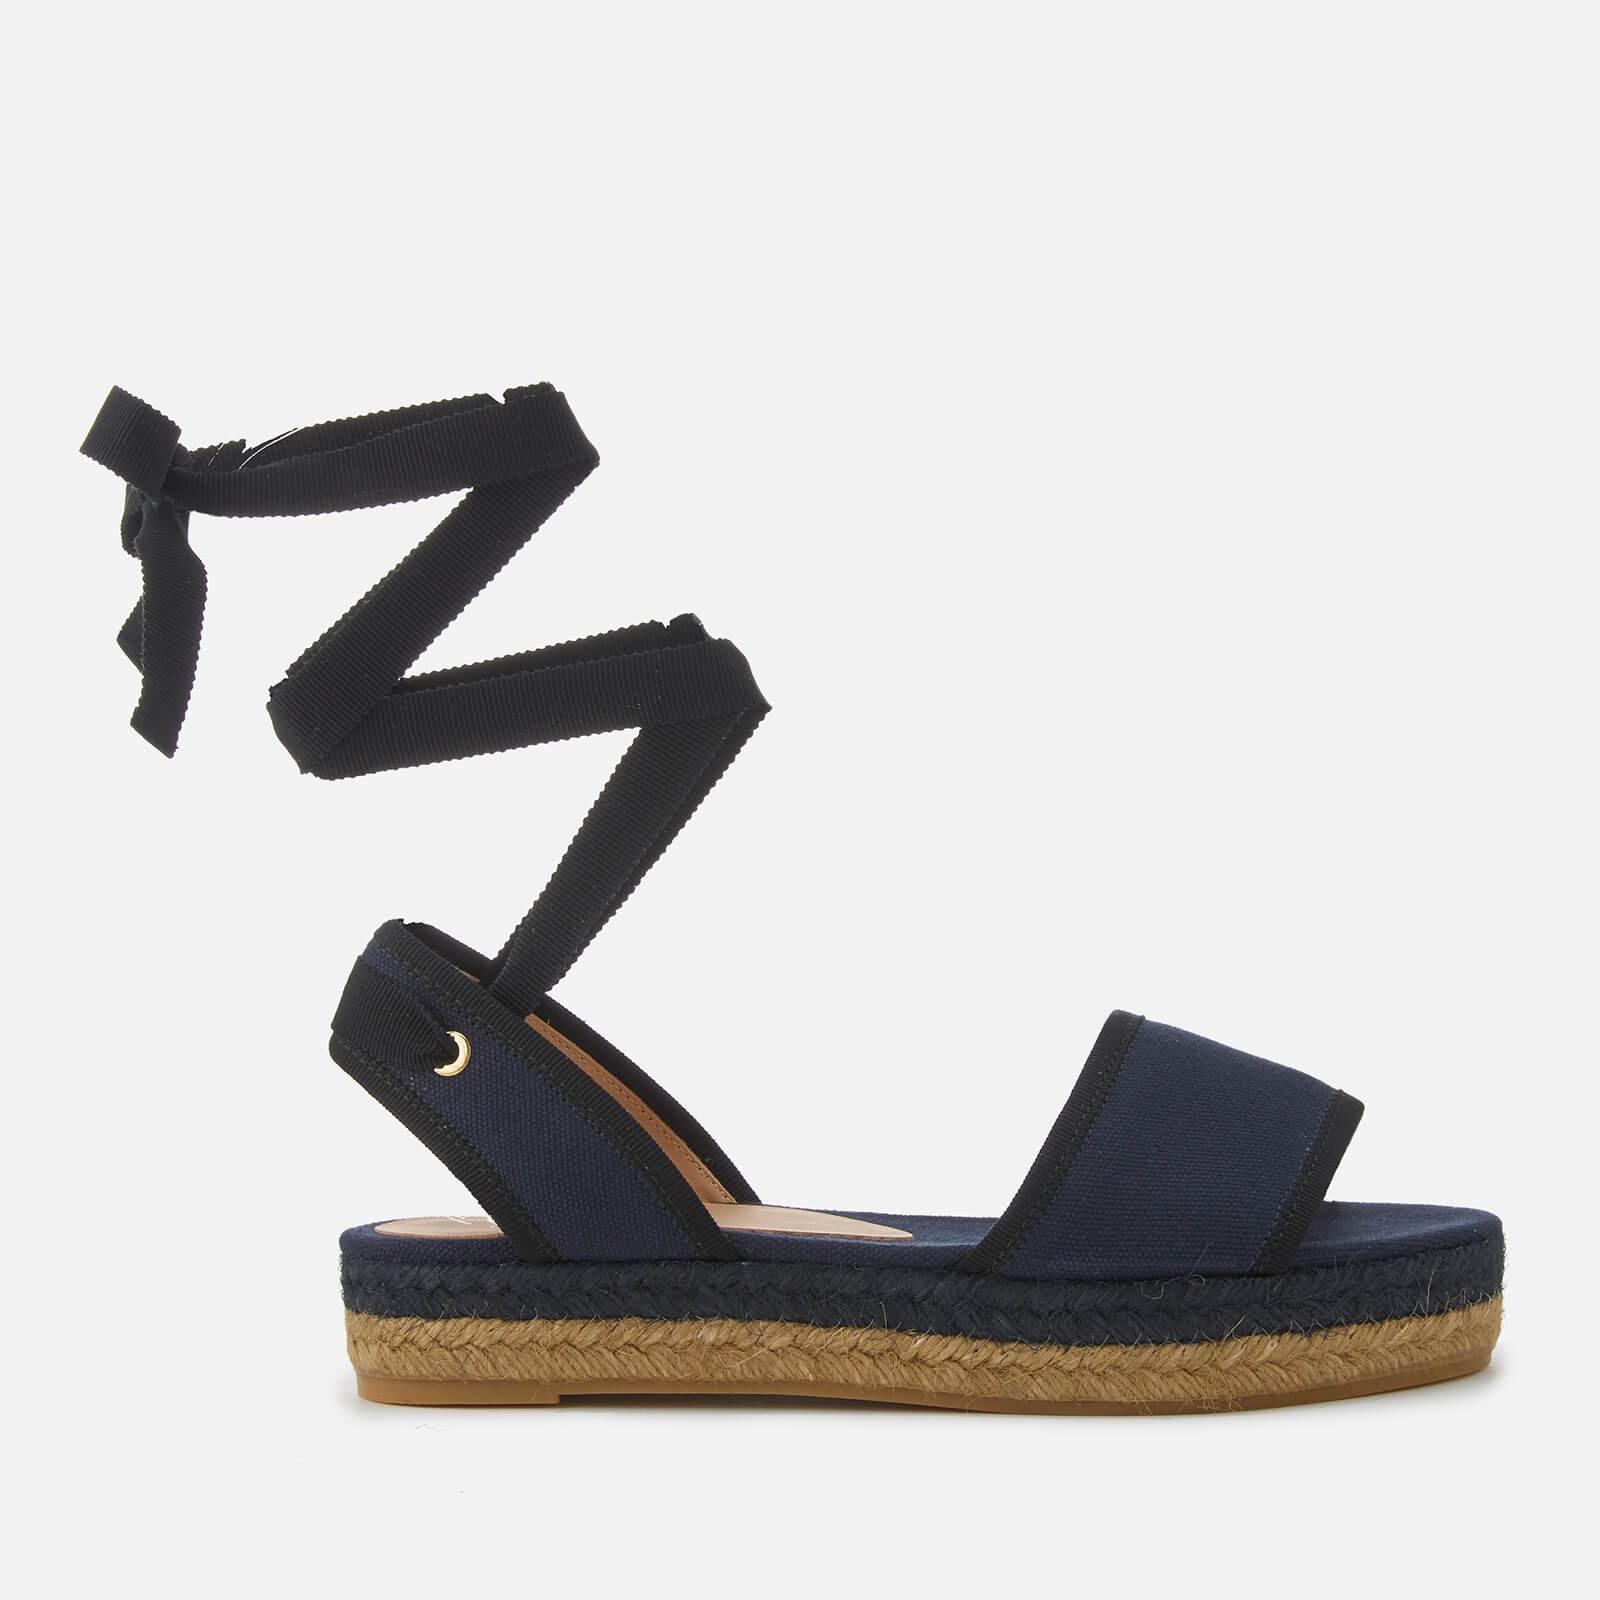 39d01ea4a21 Castañer Women s Worquidea Flat Espadrille Sandals - Azul Marino - Free UK  Delivery over £50